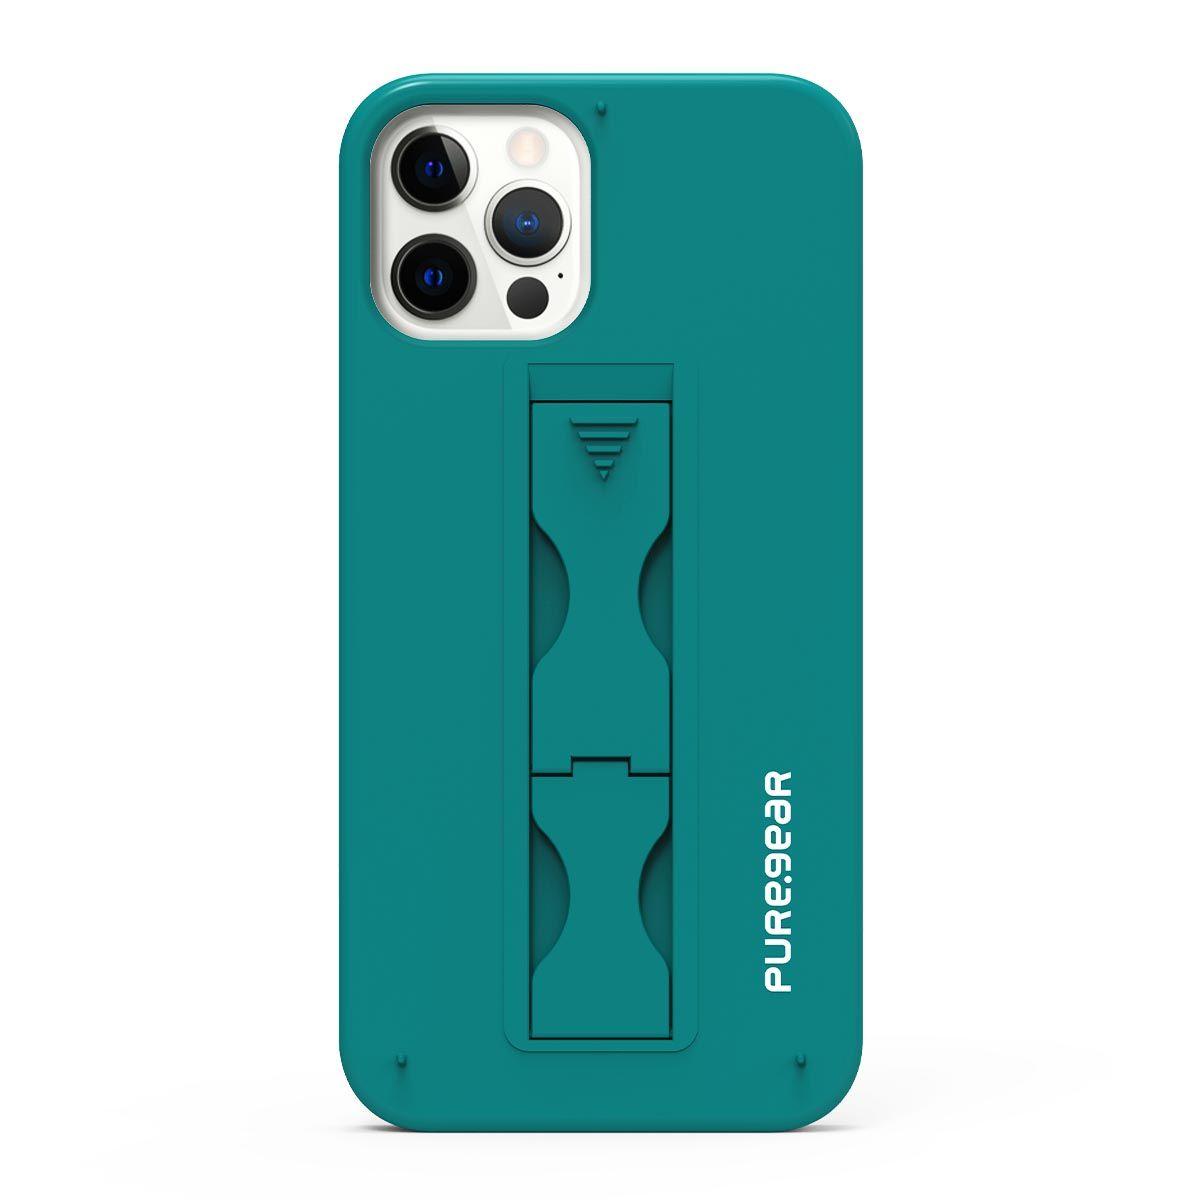 Apple iPhone 12 Pro Max SlimStik, Antimicrobial Kickstand Case – Blue Lagoon